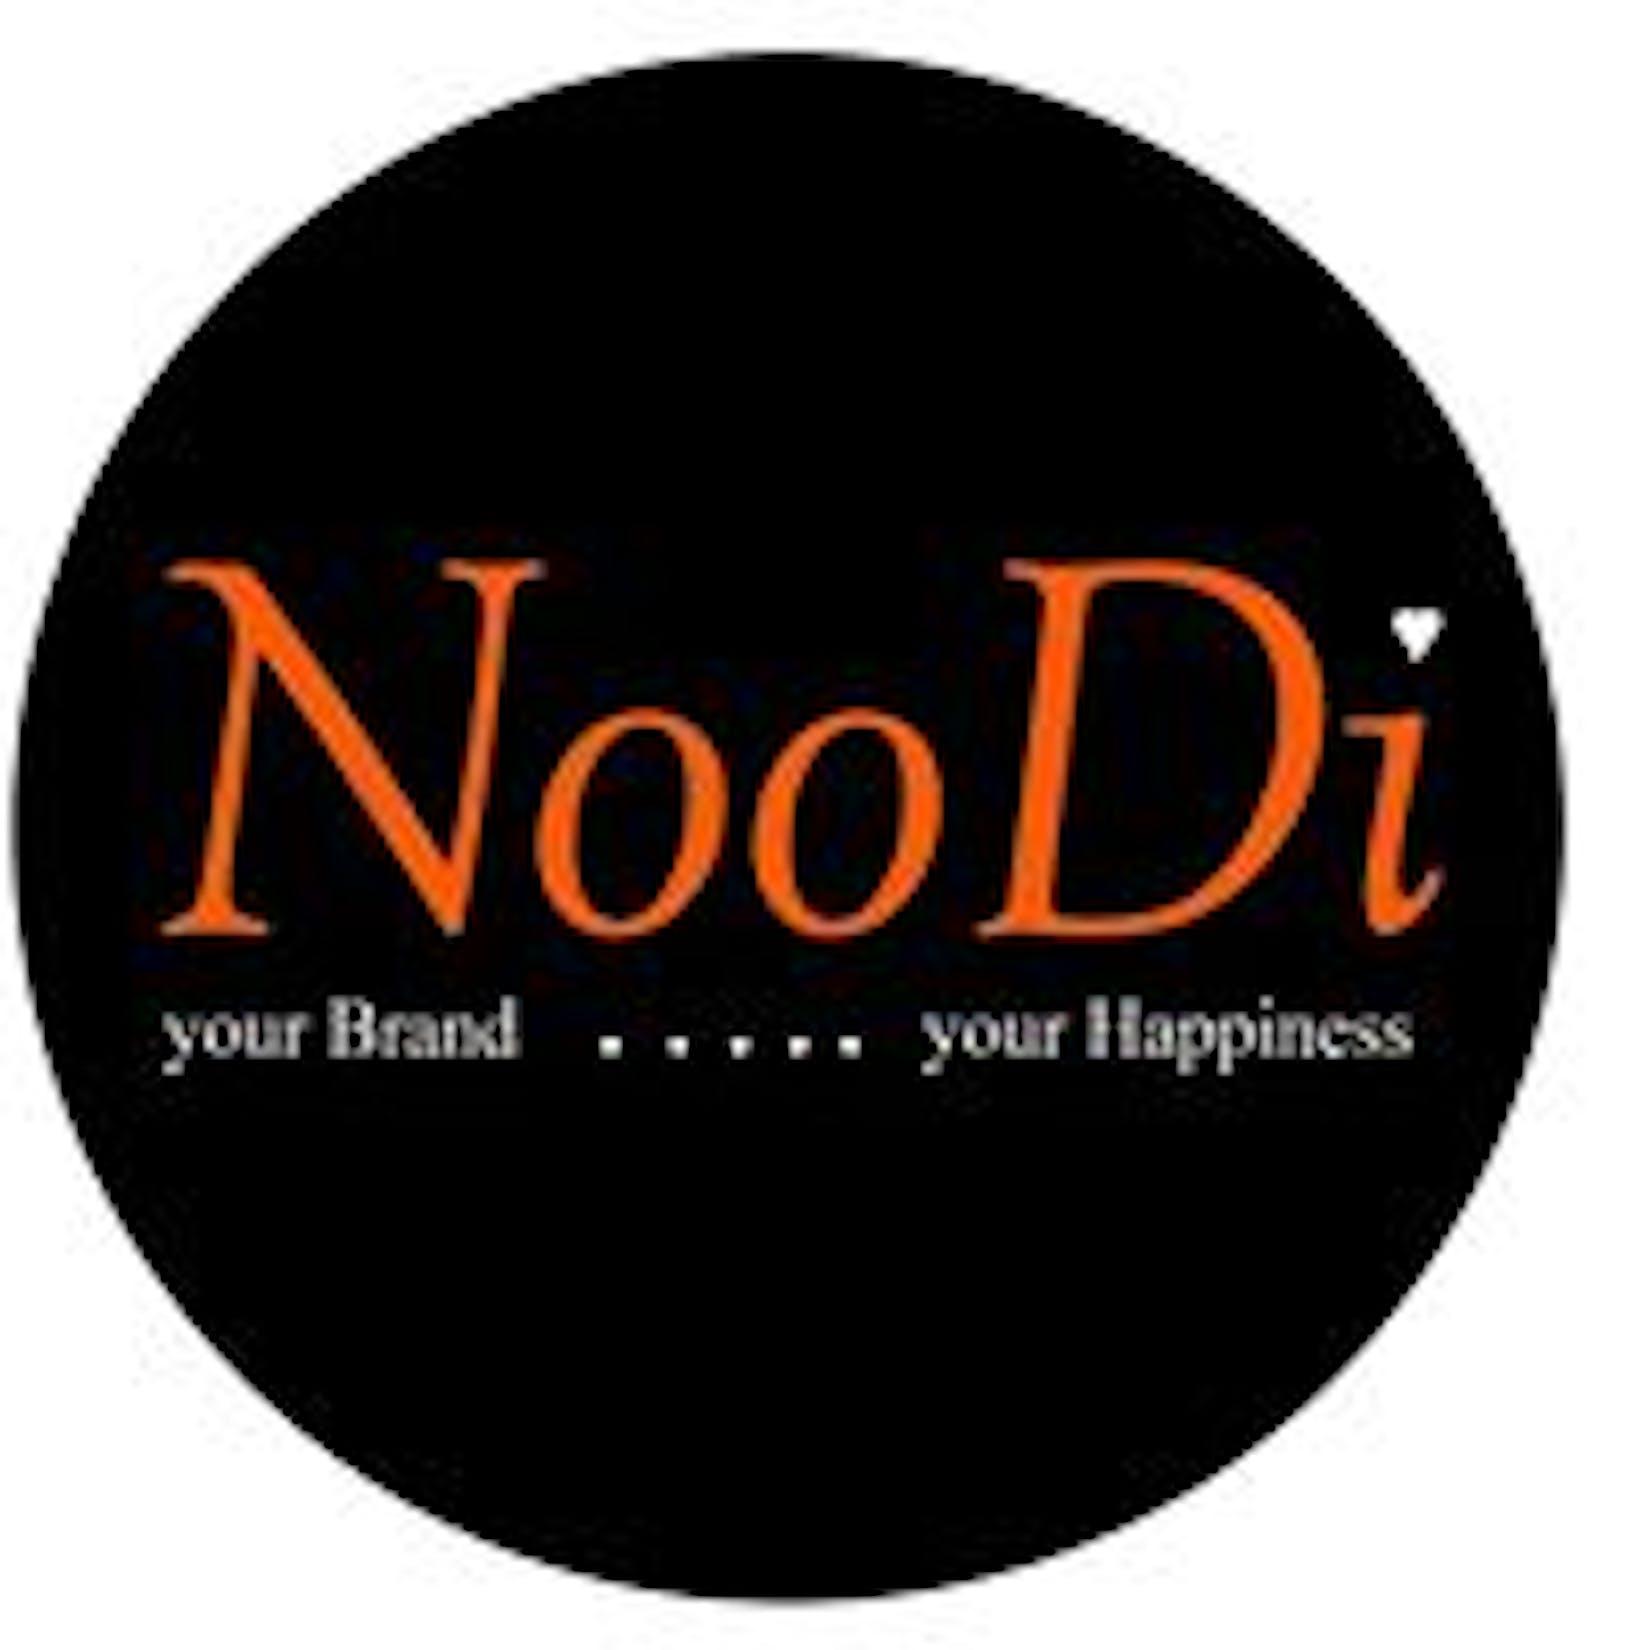 Noodi Noodle | yathar